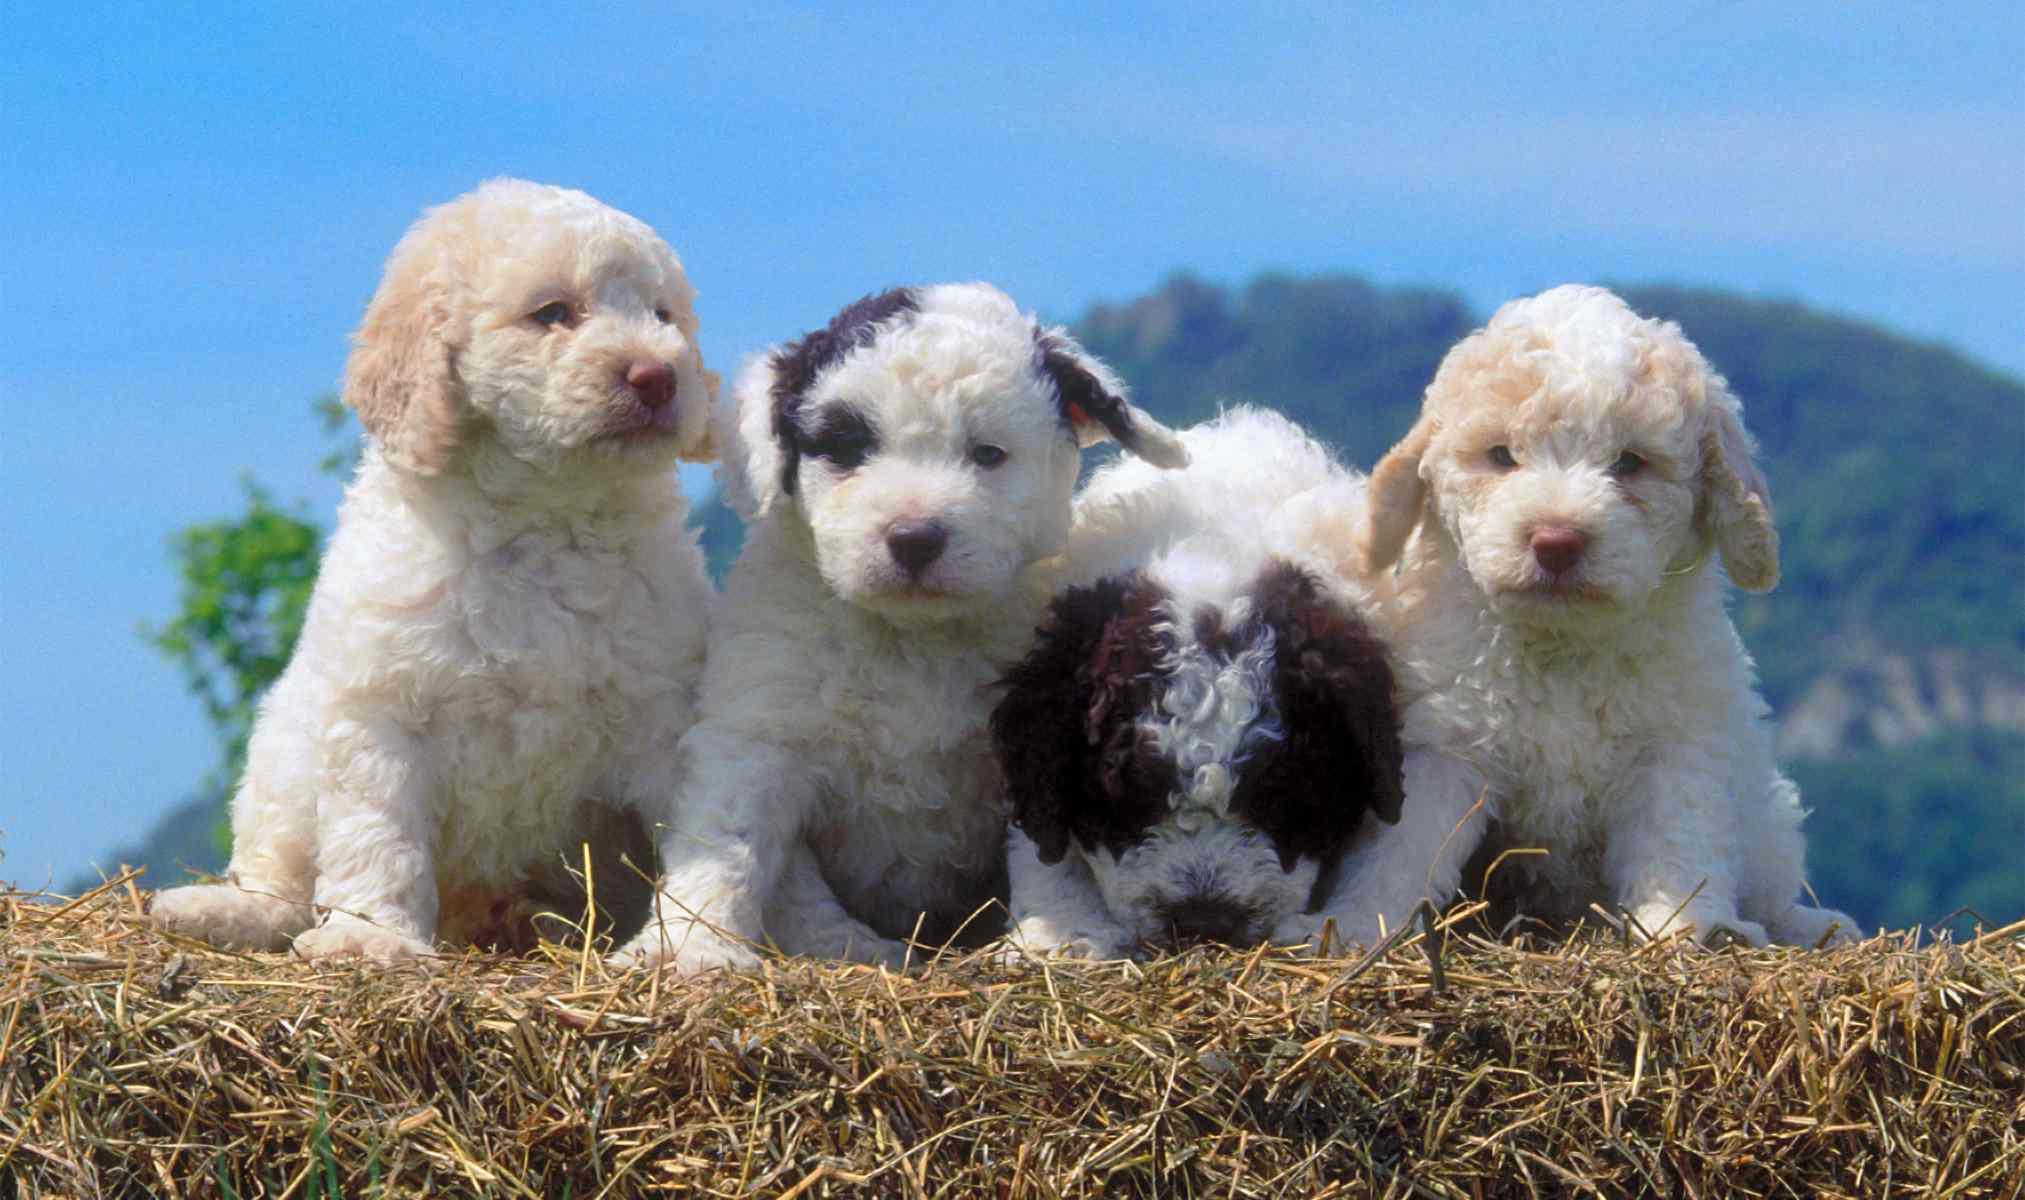 Lagotto Romagnolo Puppies